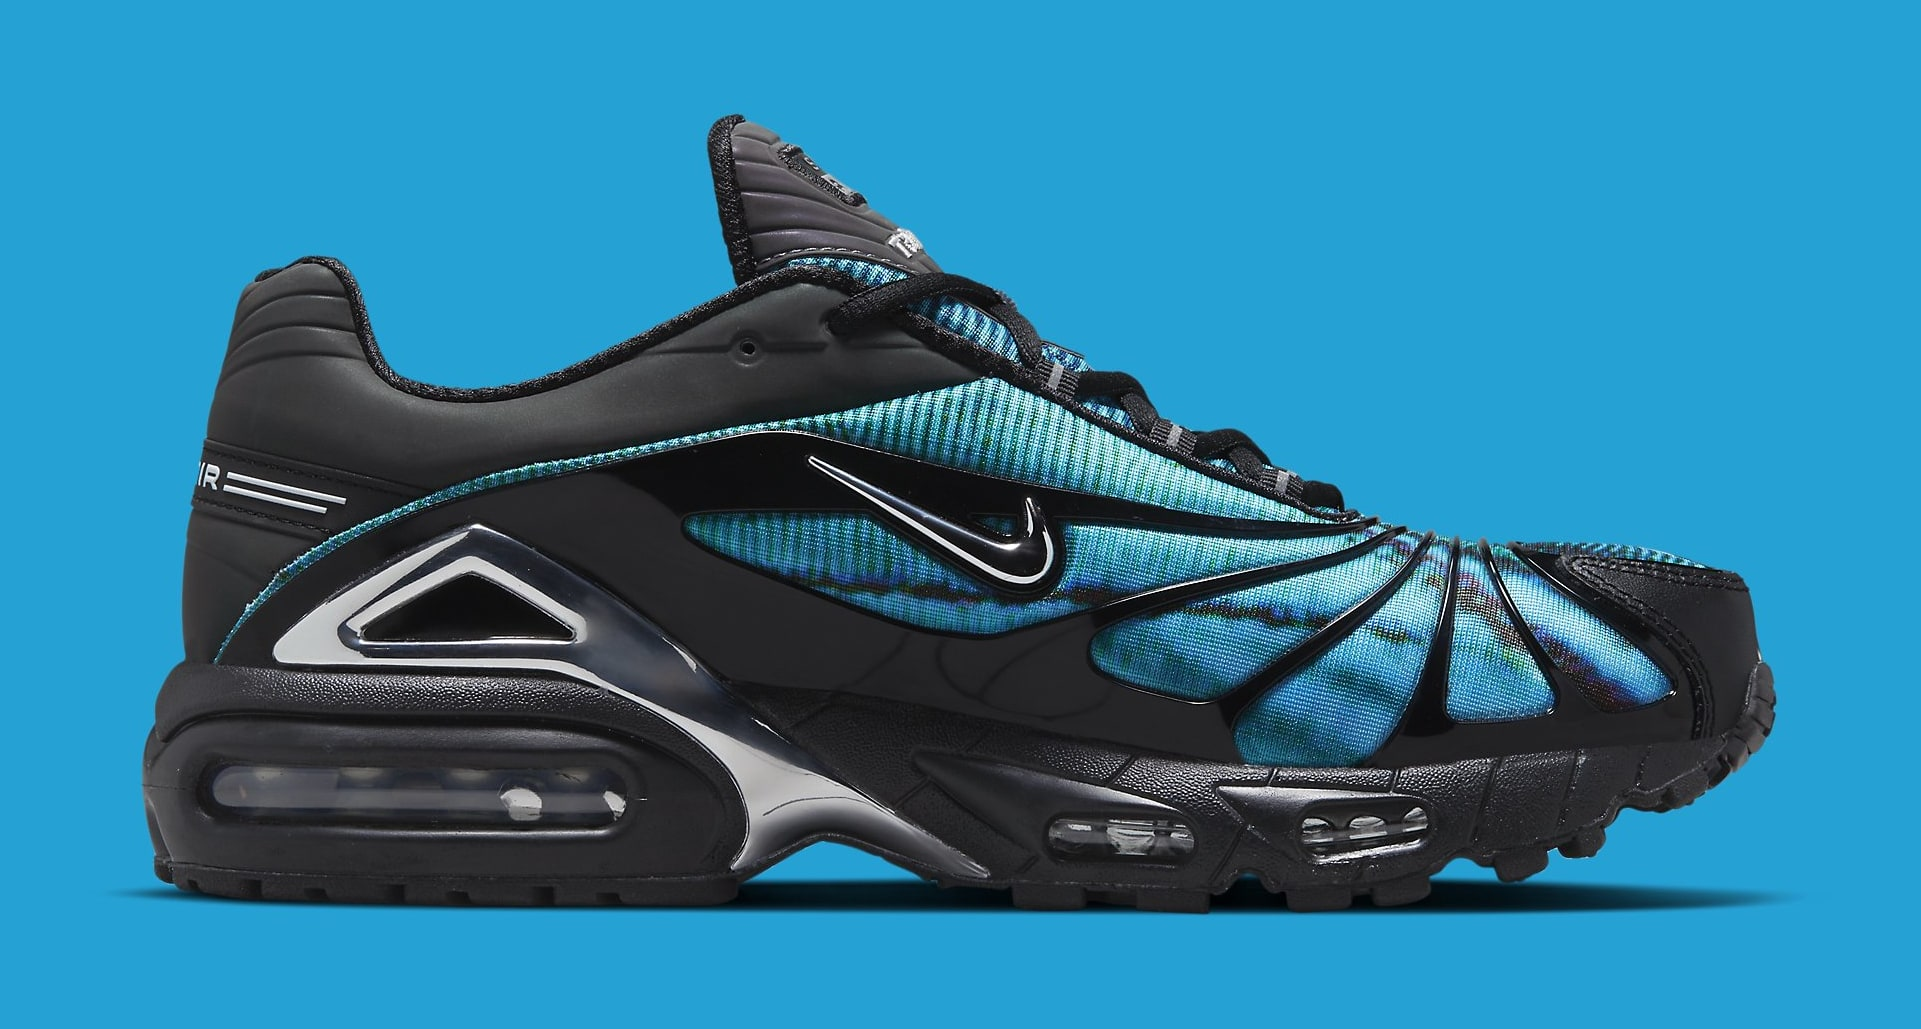 Skepta x Nike Air Tailwind V 'Blue' CQ8714-001 Medial